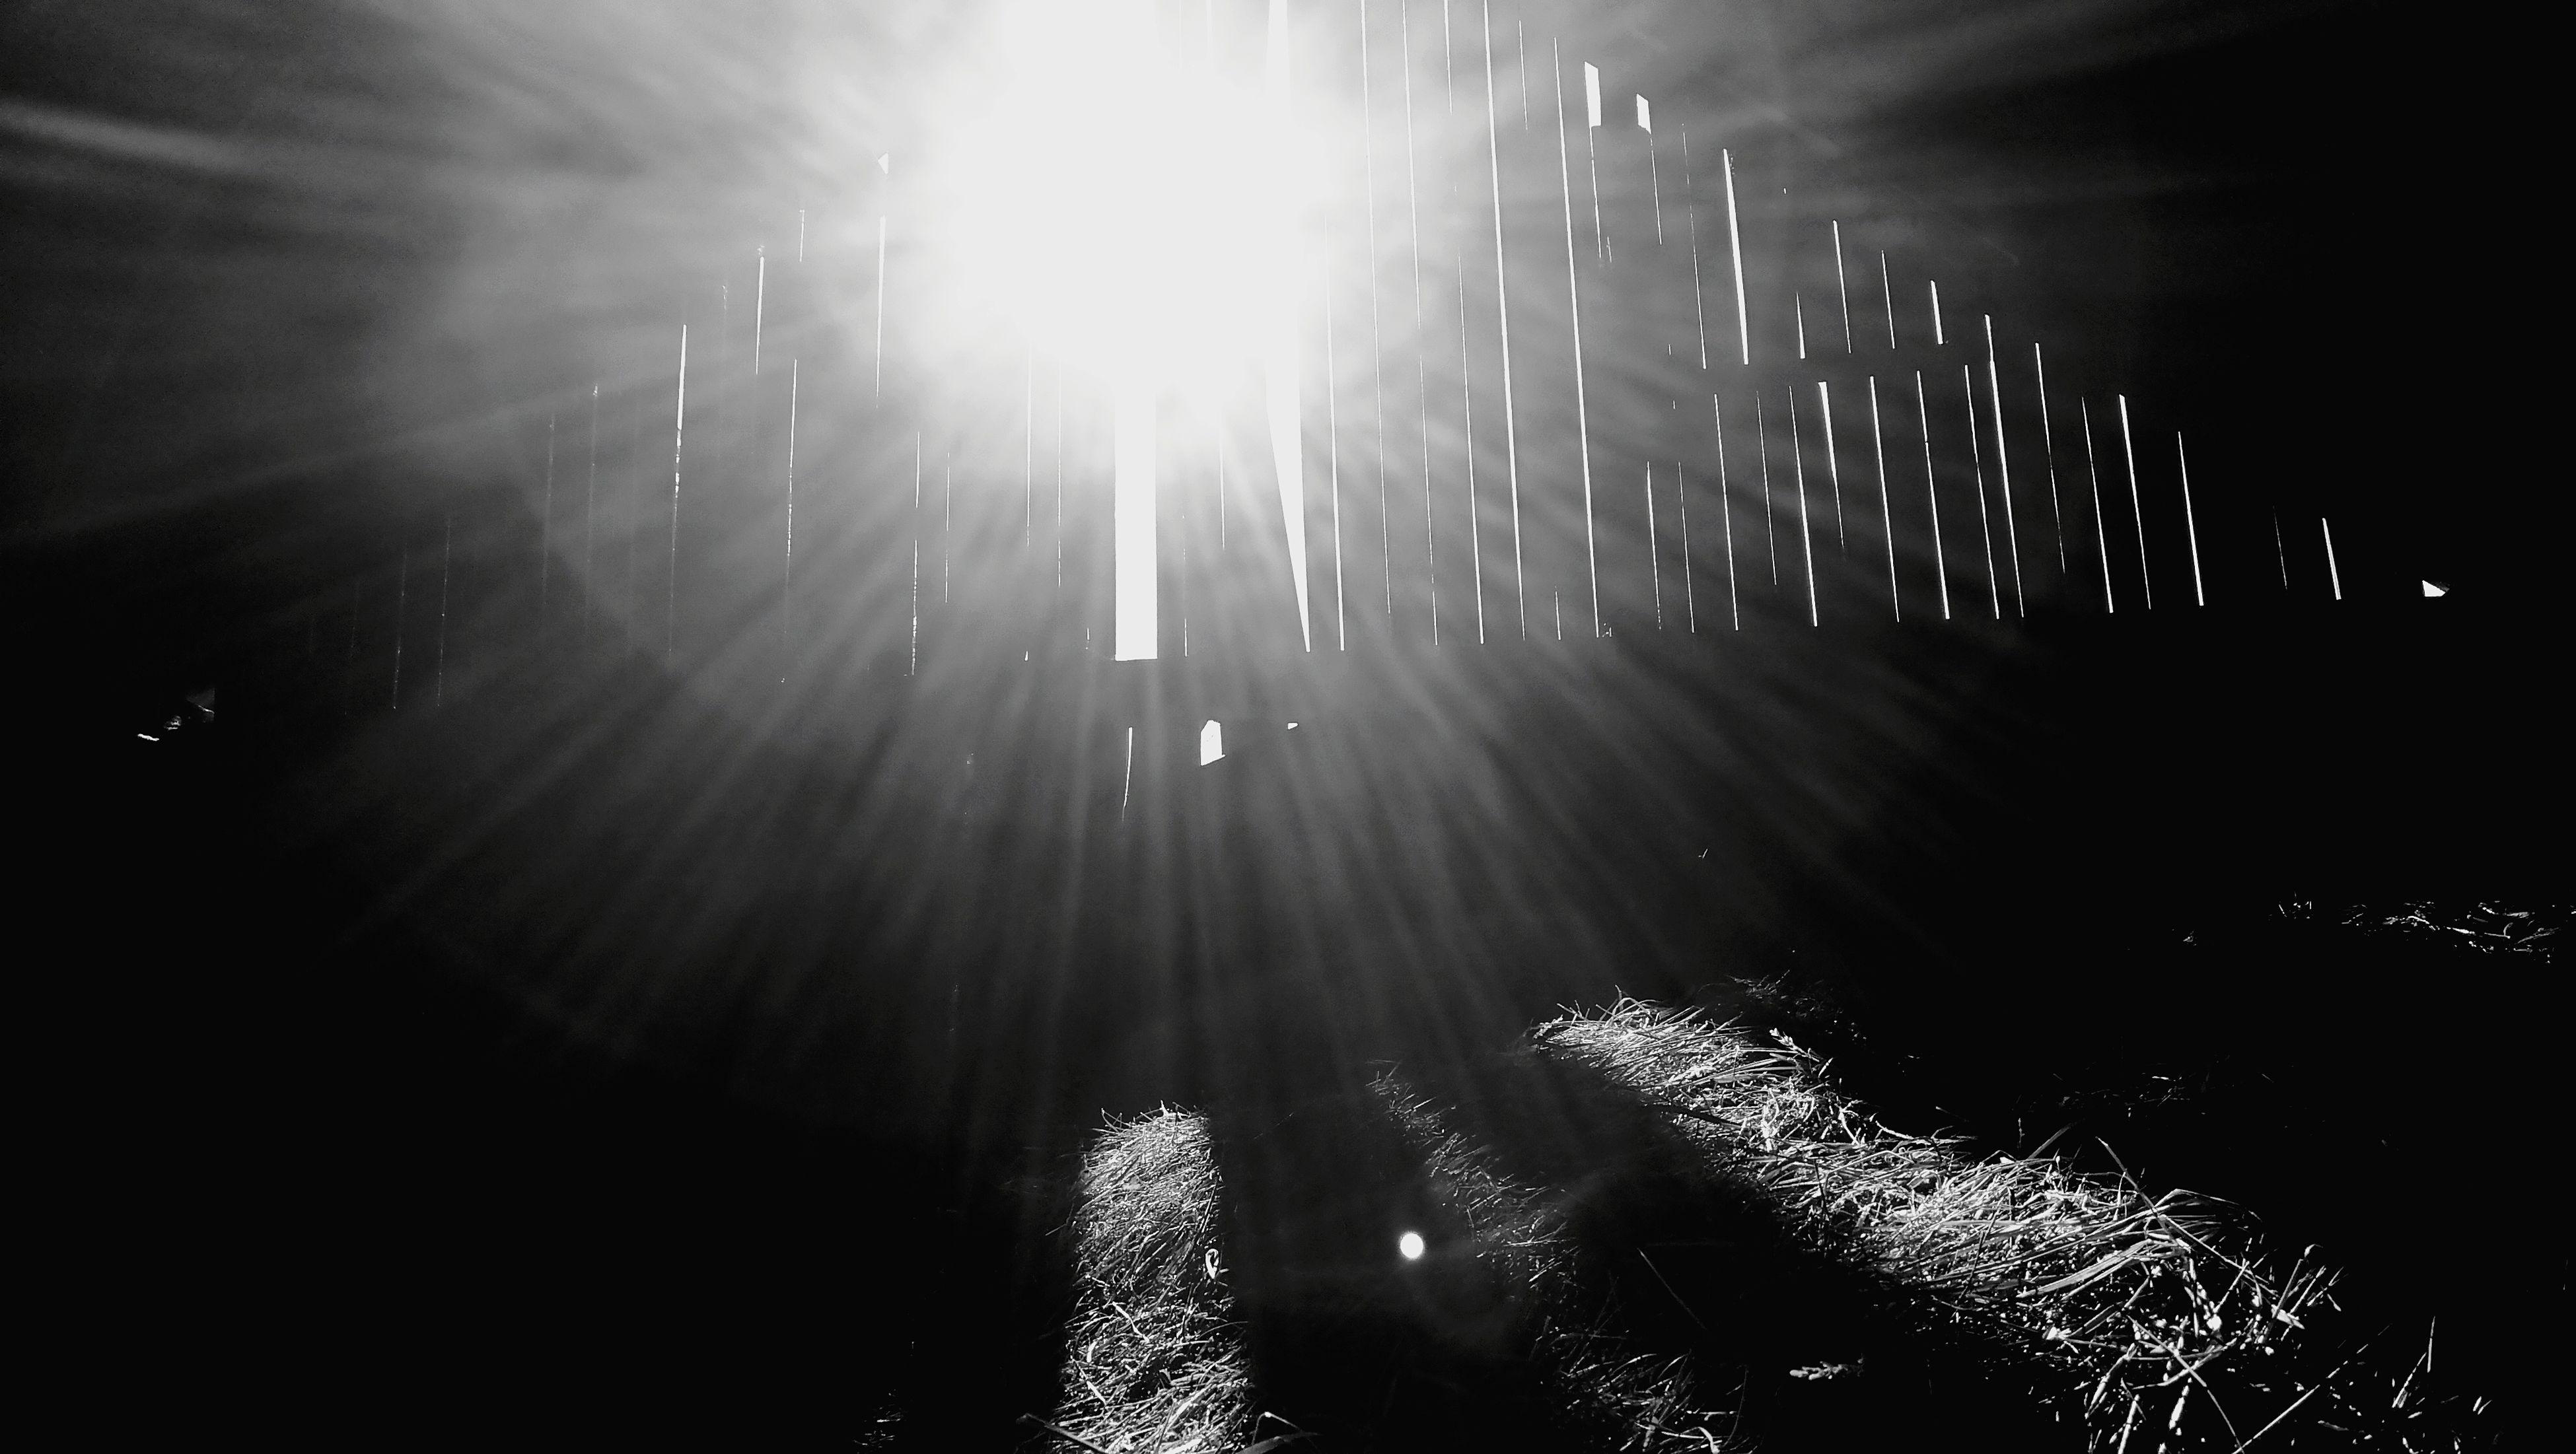 sunbeam, lens flare, sunlight, sun, illuminated, light beam, outdoors, no people, winter, nature, cold temperature, sky